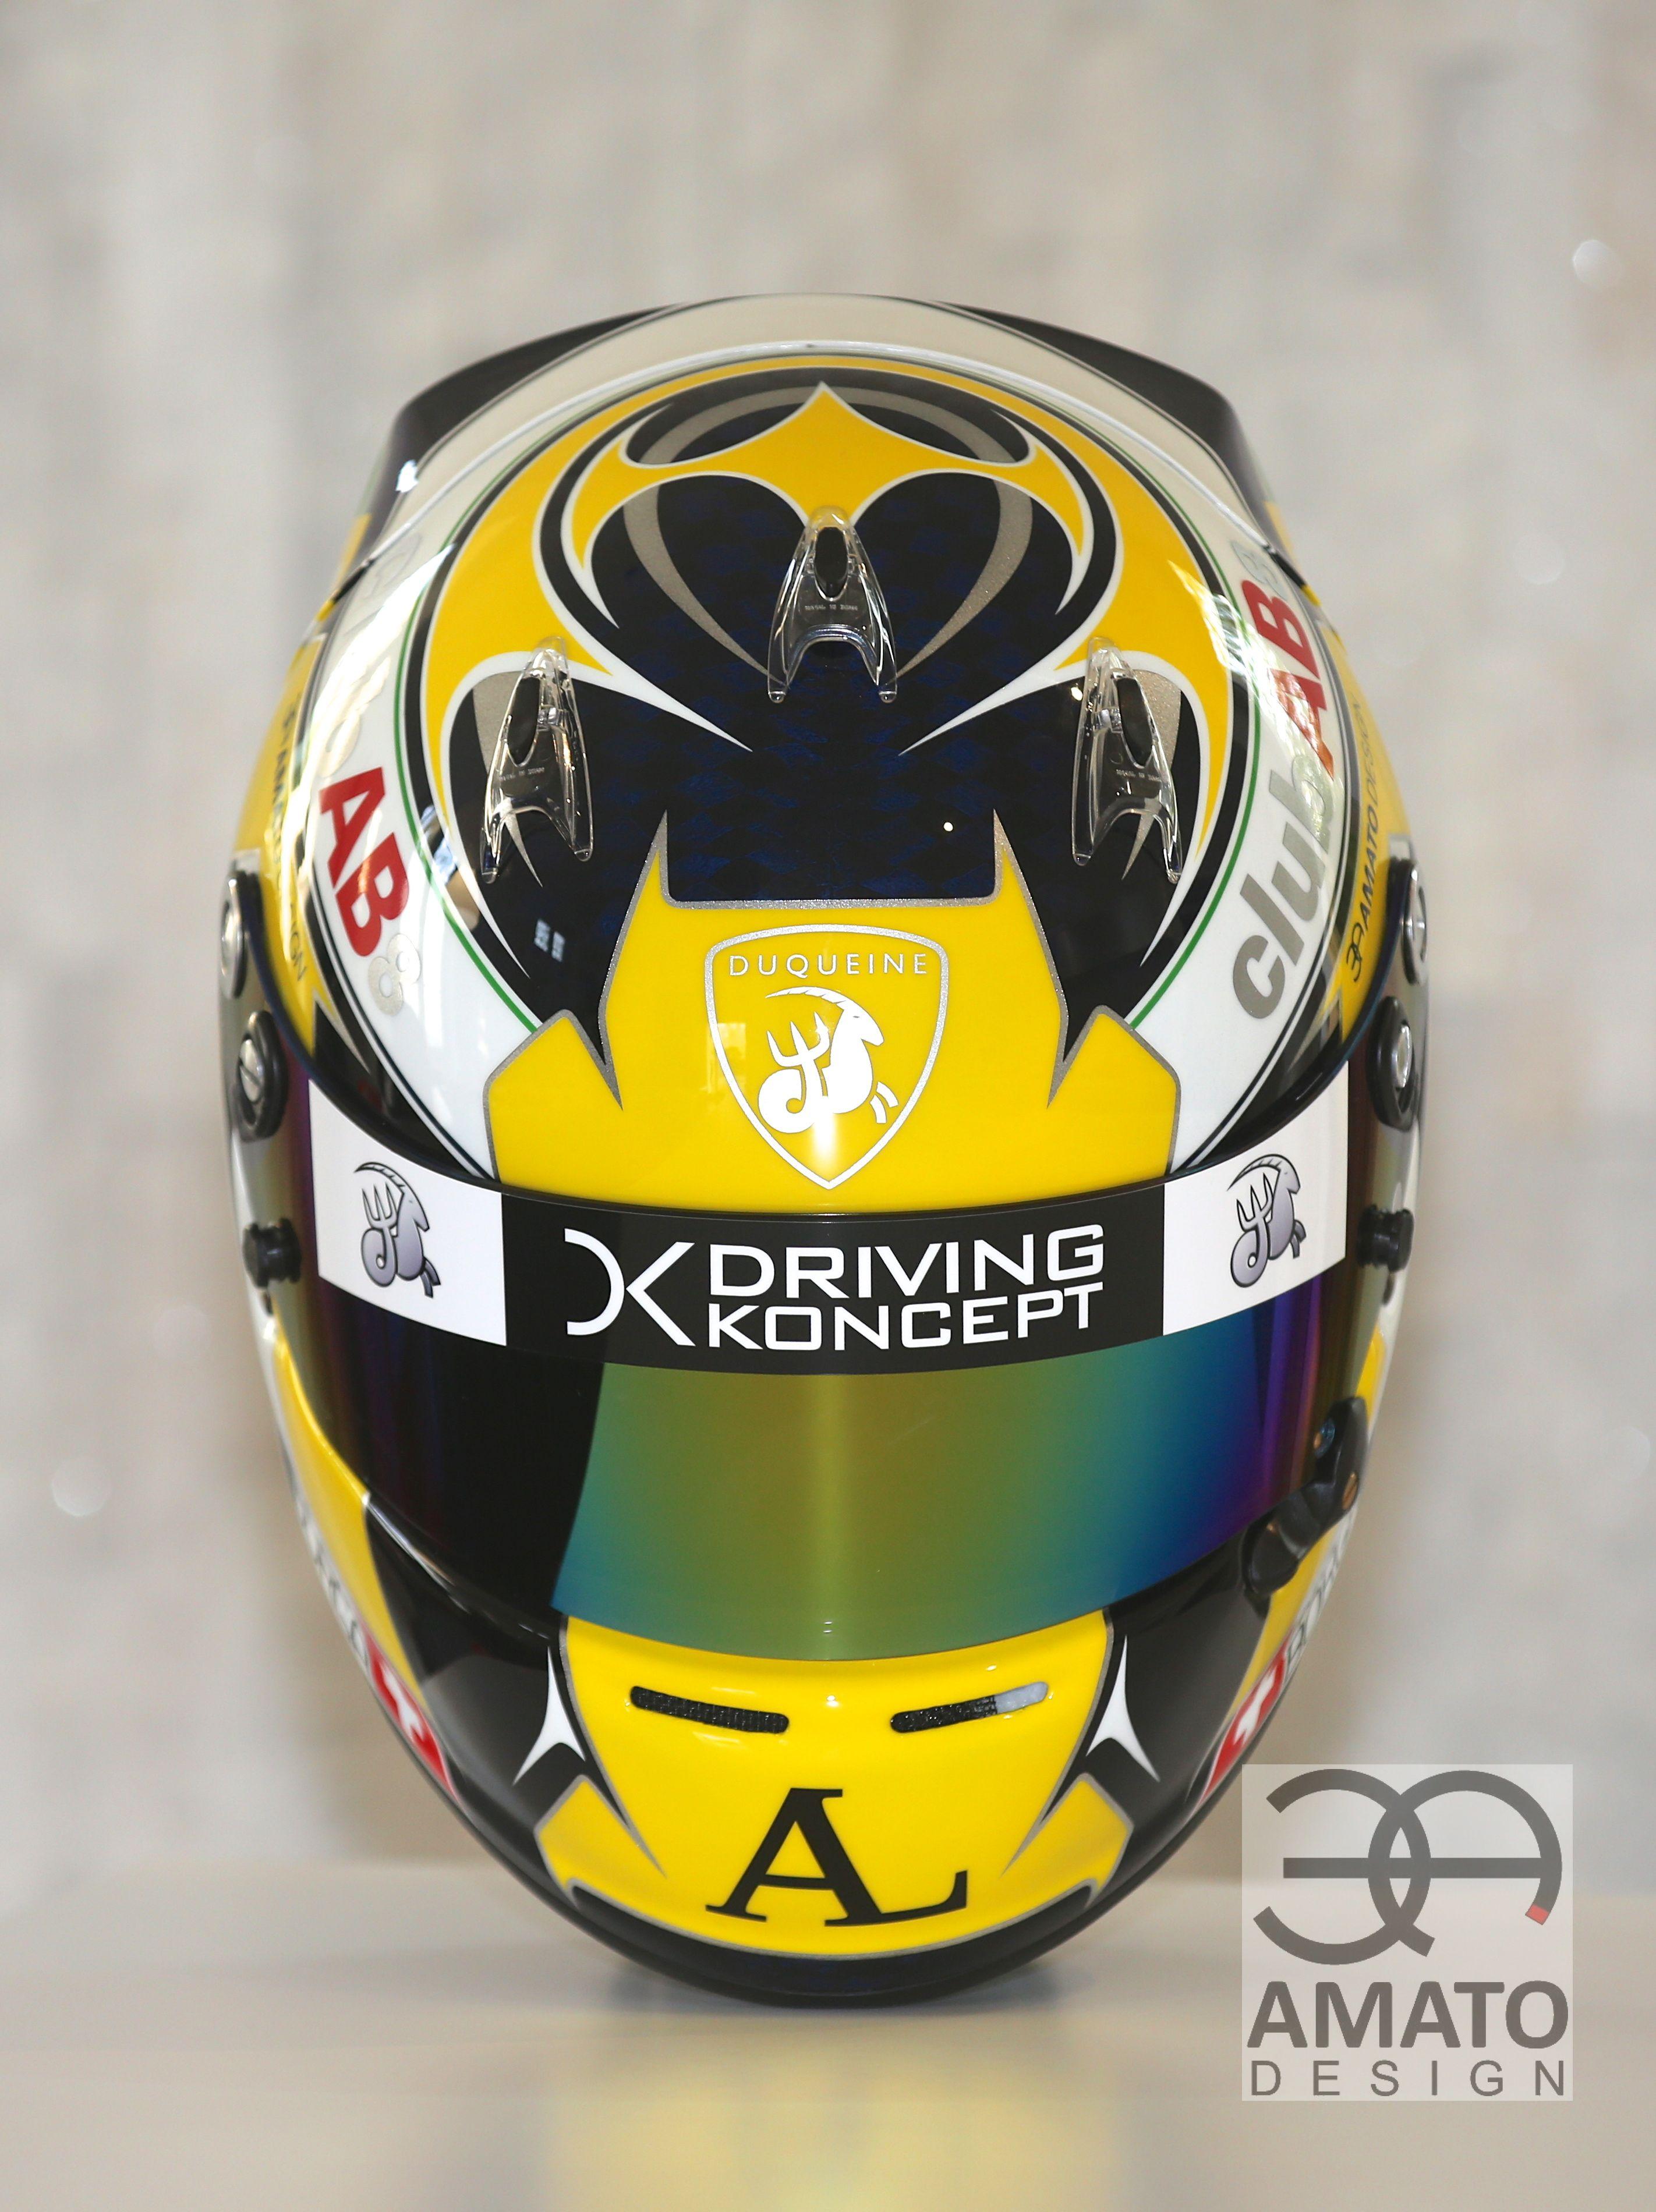 Nouveau casque AMATO DESIGN pour Antonin BORGA